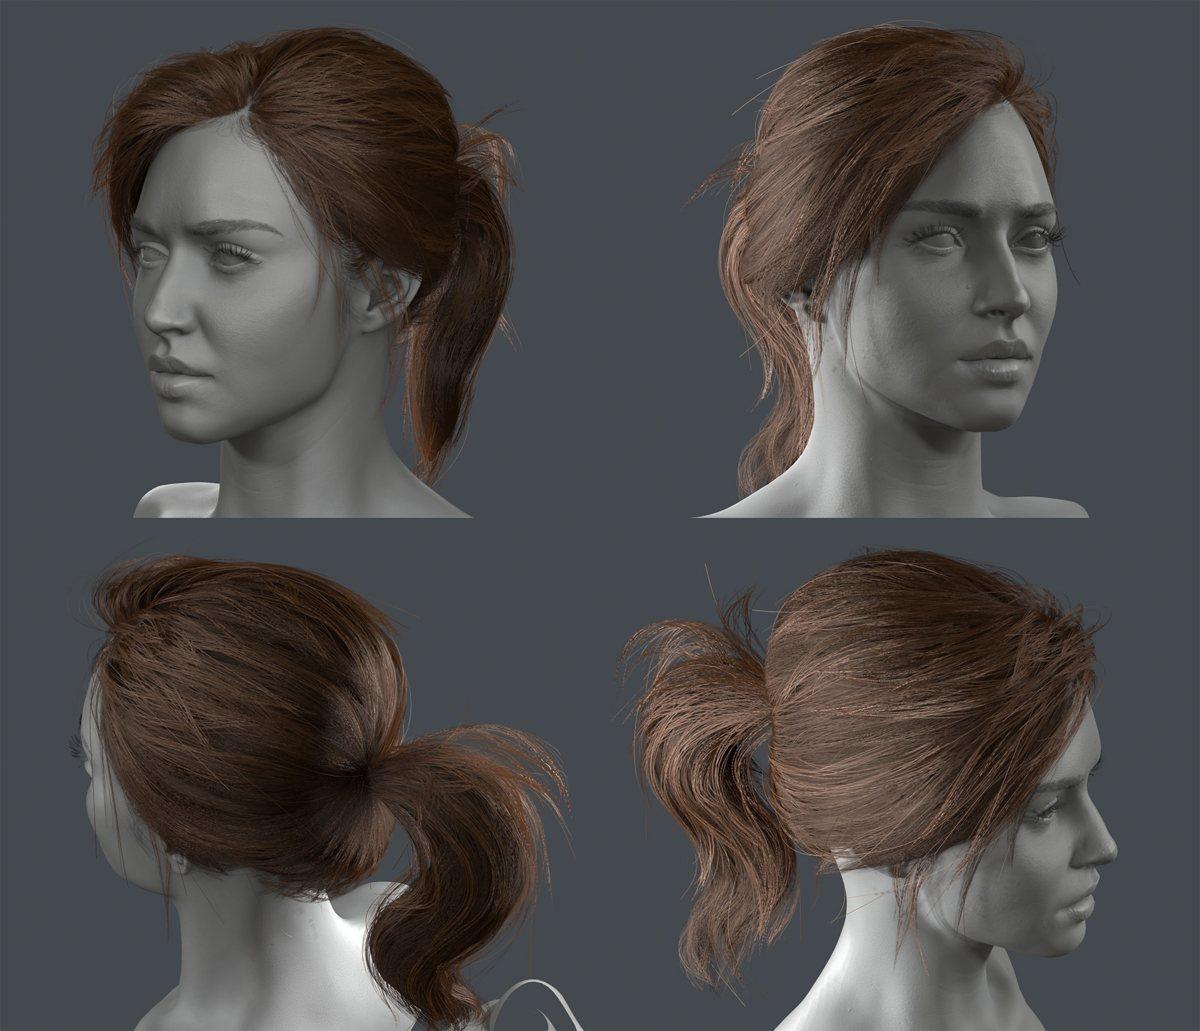 Мохнатики захватывают рынок игровой индустрии! Peregrine Labs объявили о коллаборации с Epic Games - 3